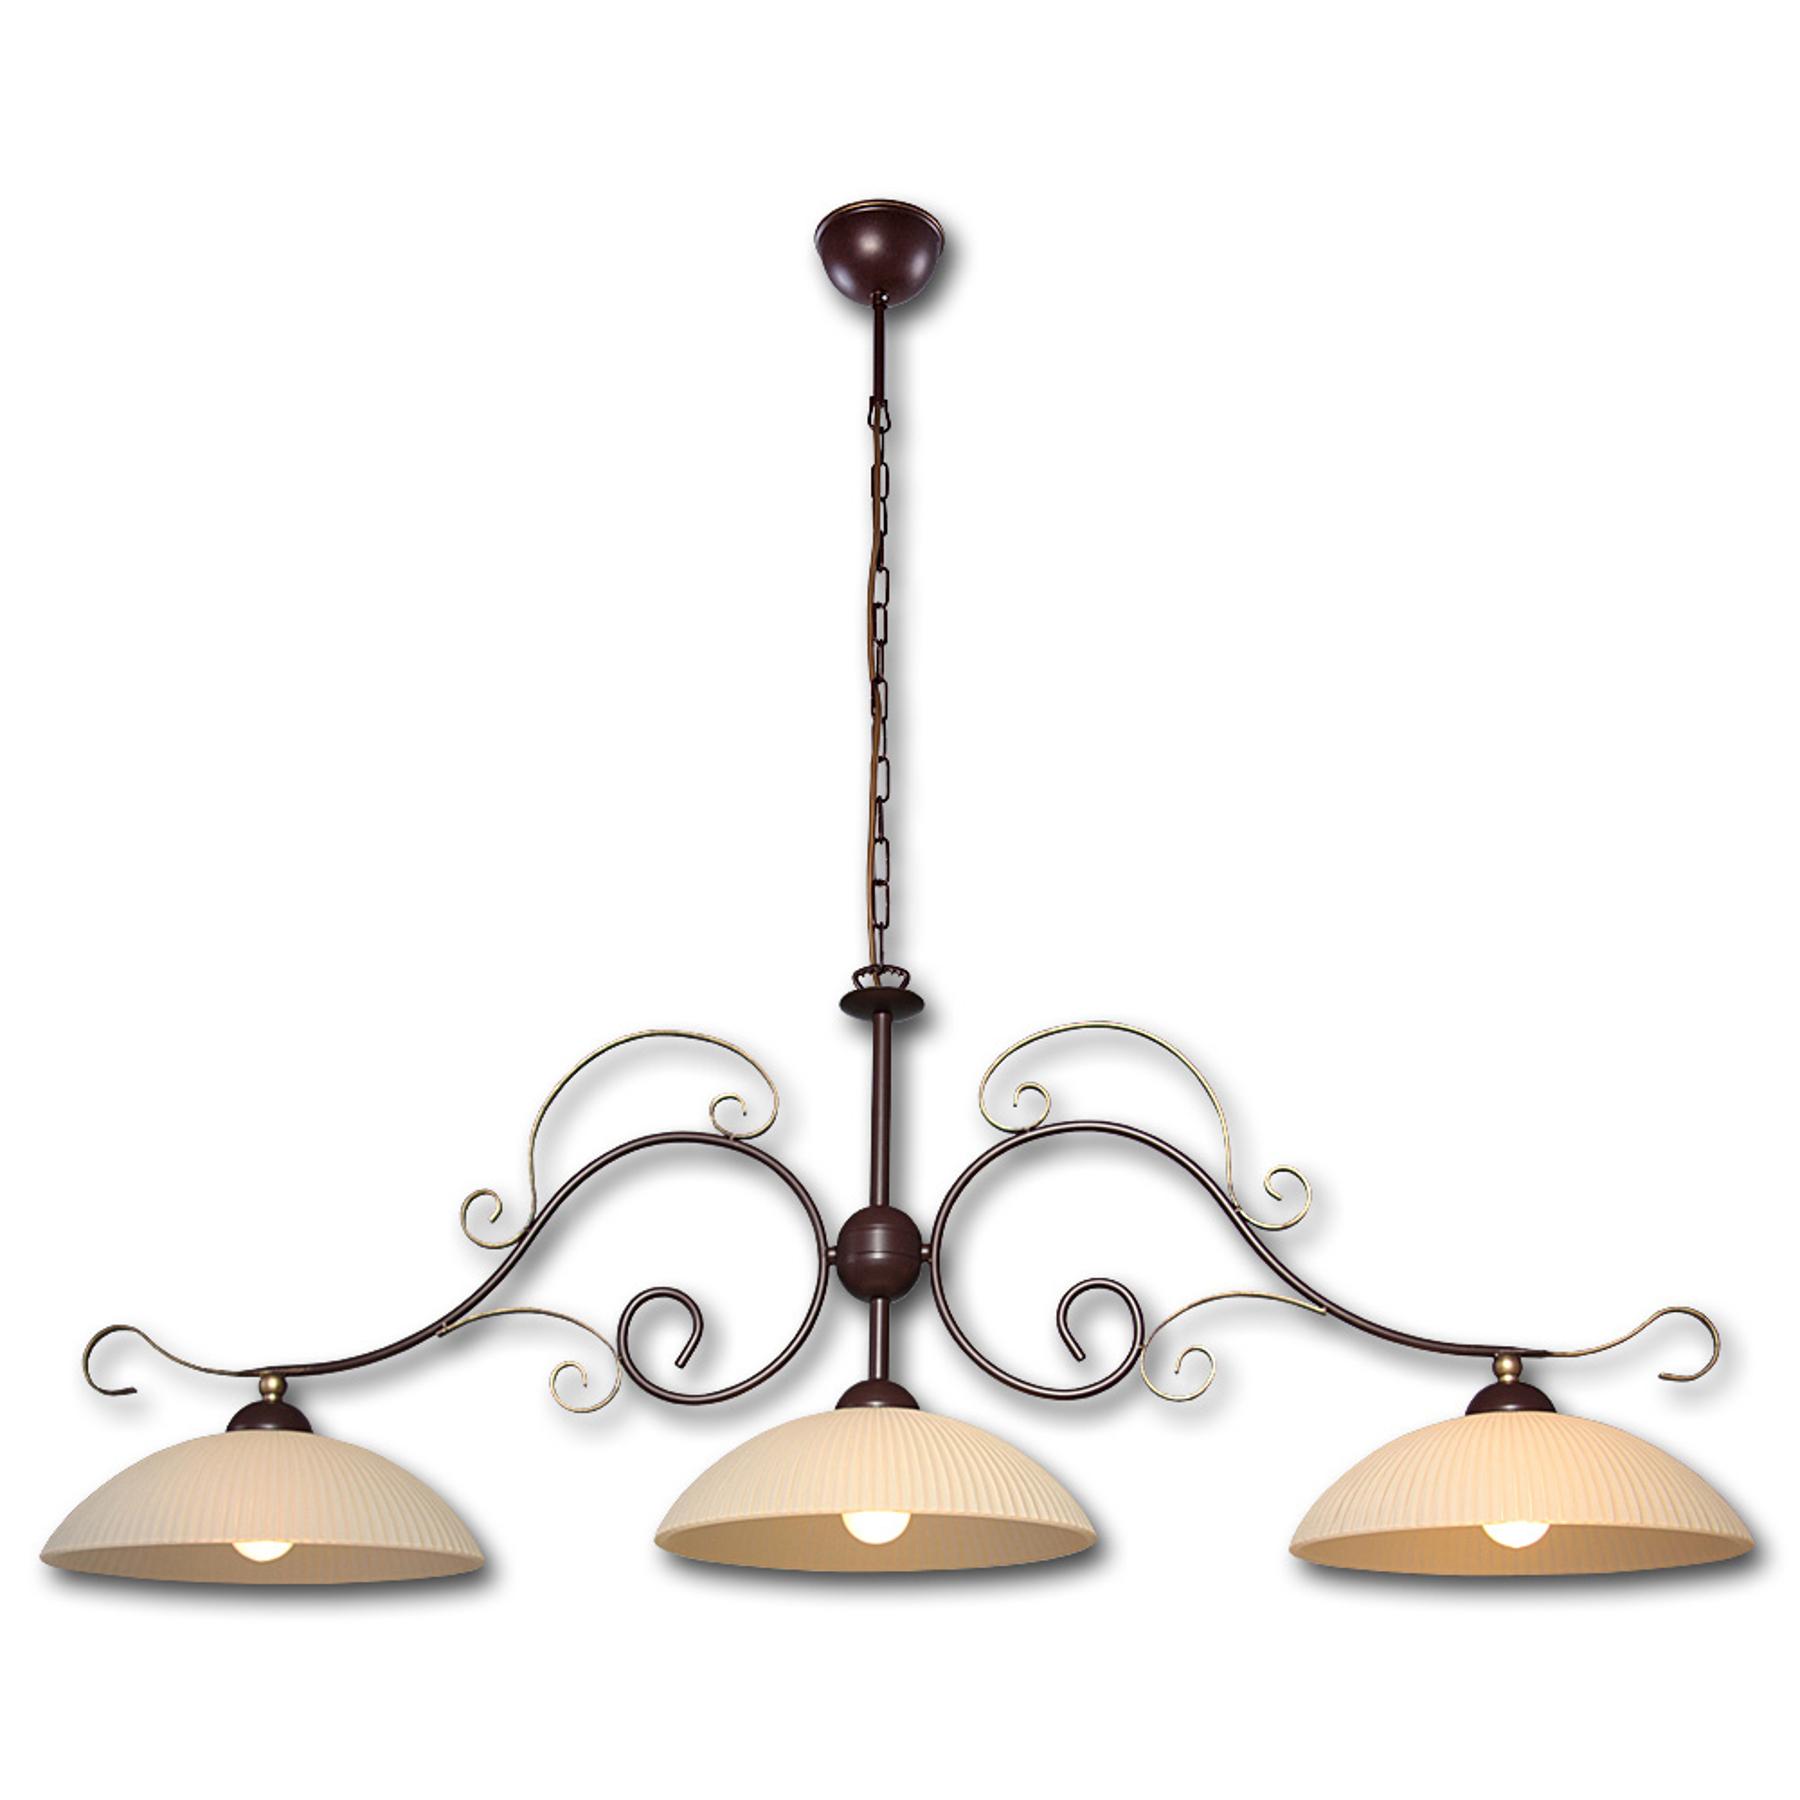 Lampa wisząca Idella, 3-punktowa